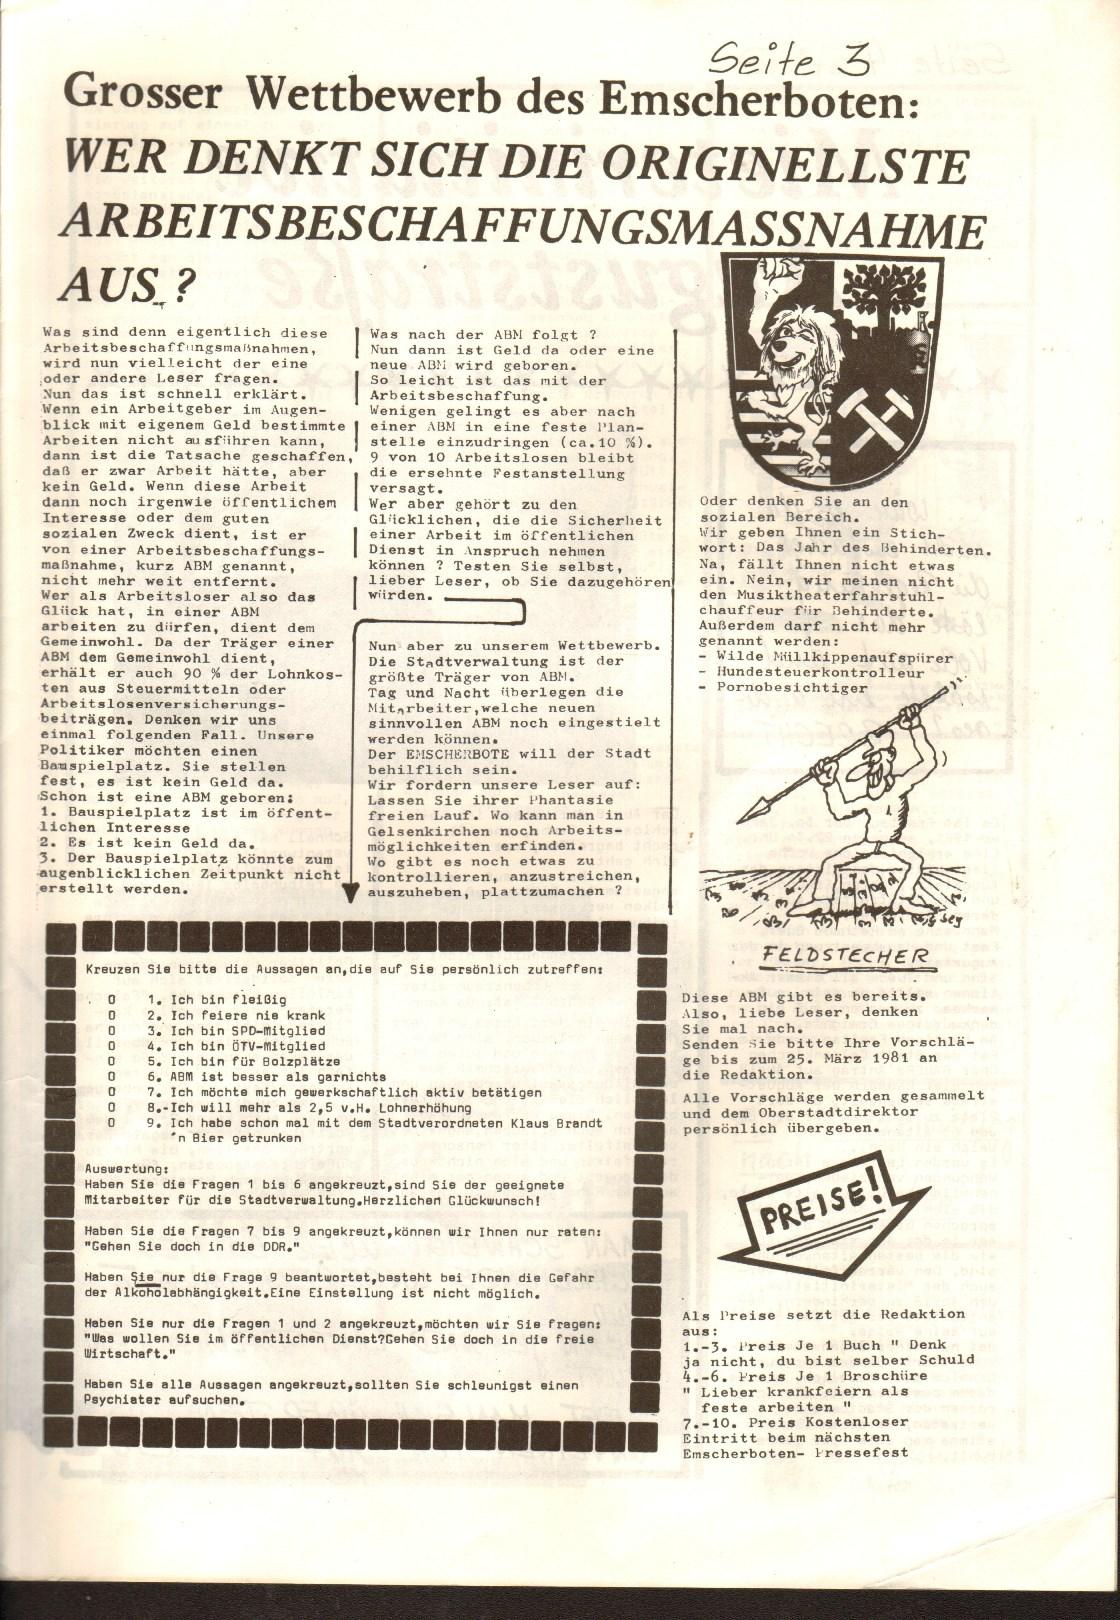 Gelsenkirchen_Emscherbote_1981_05_03